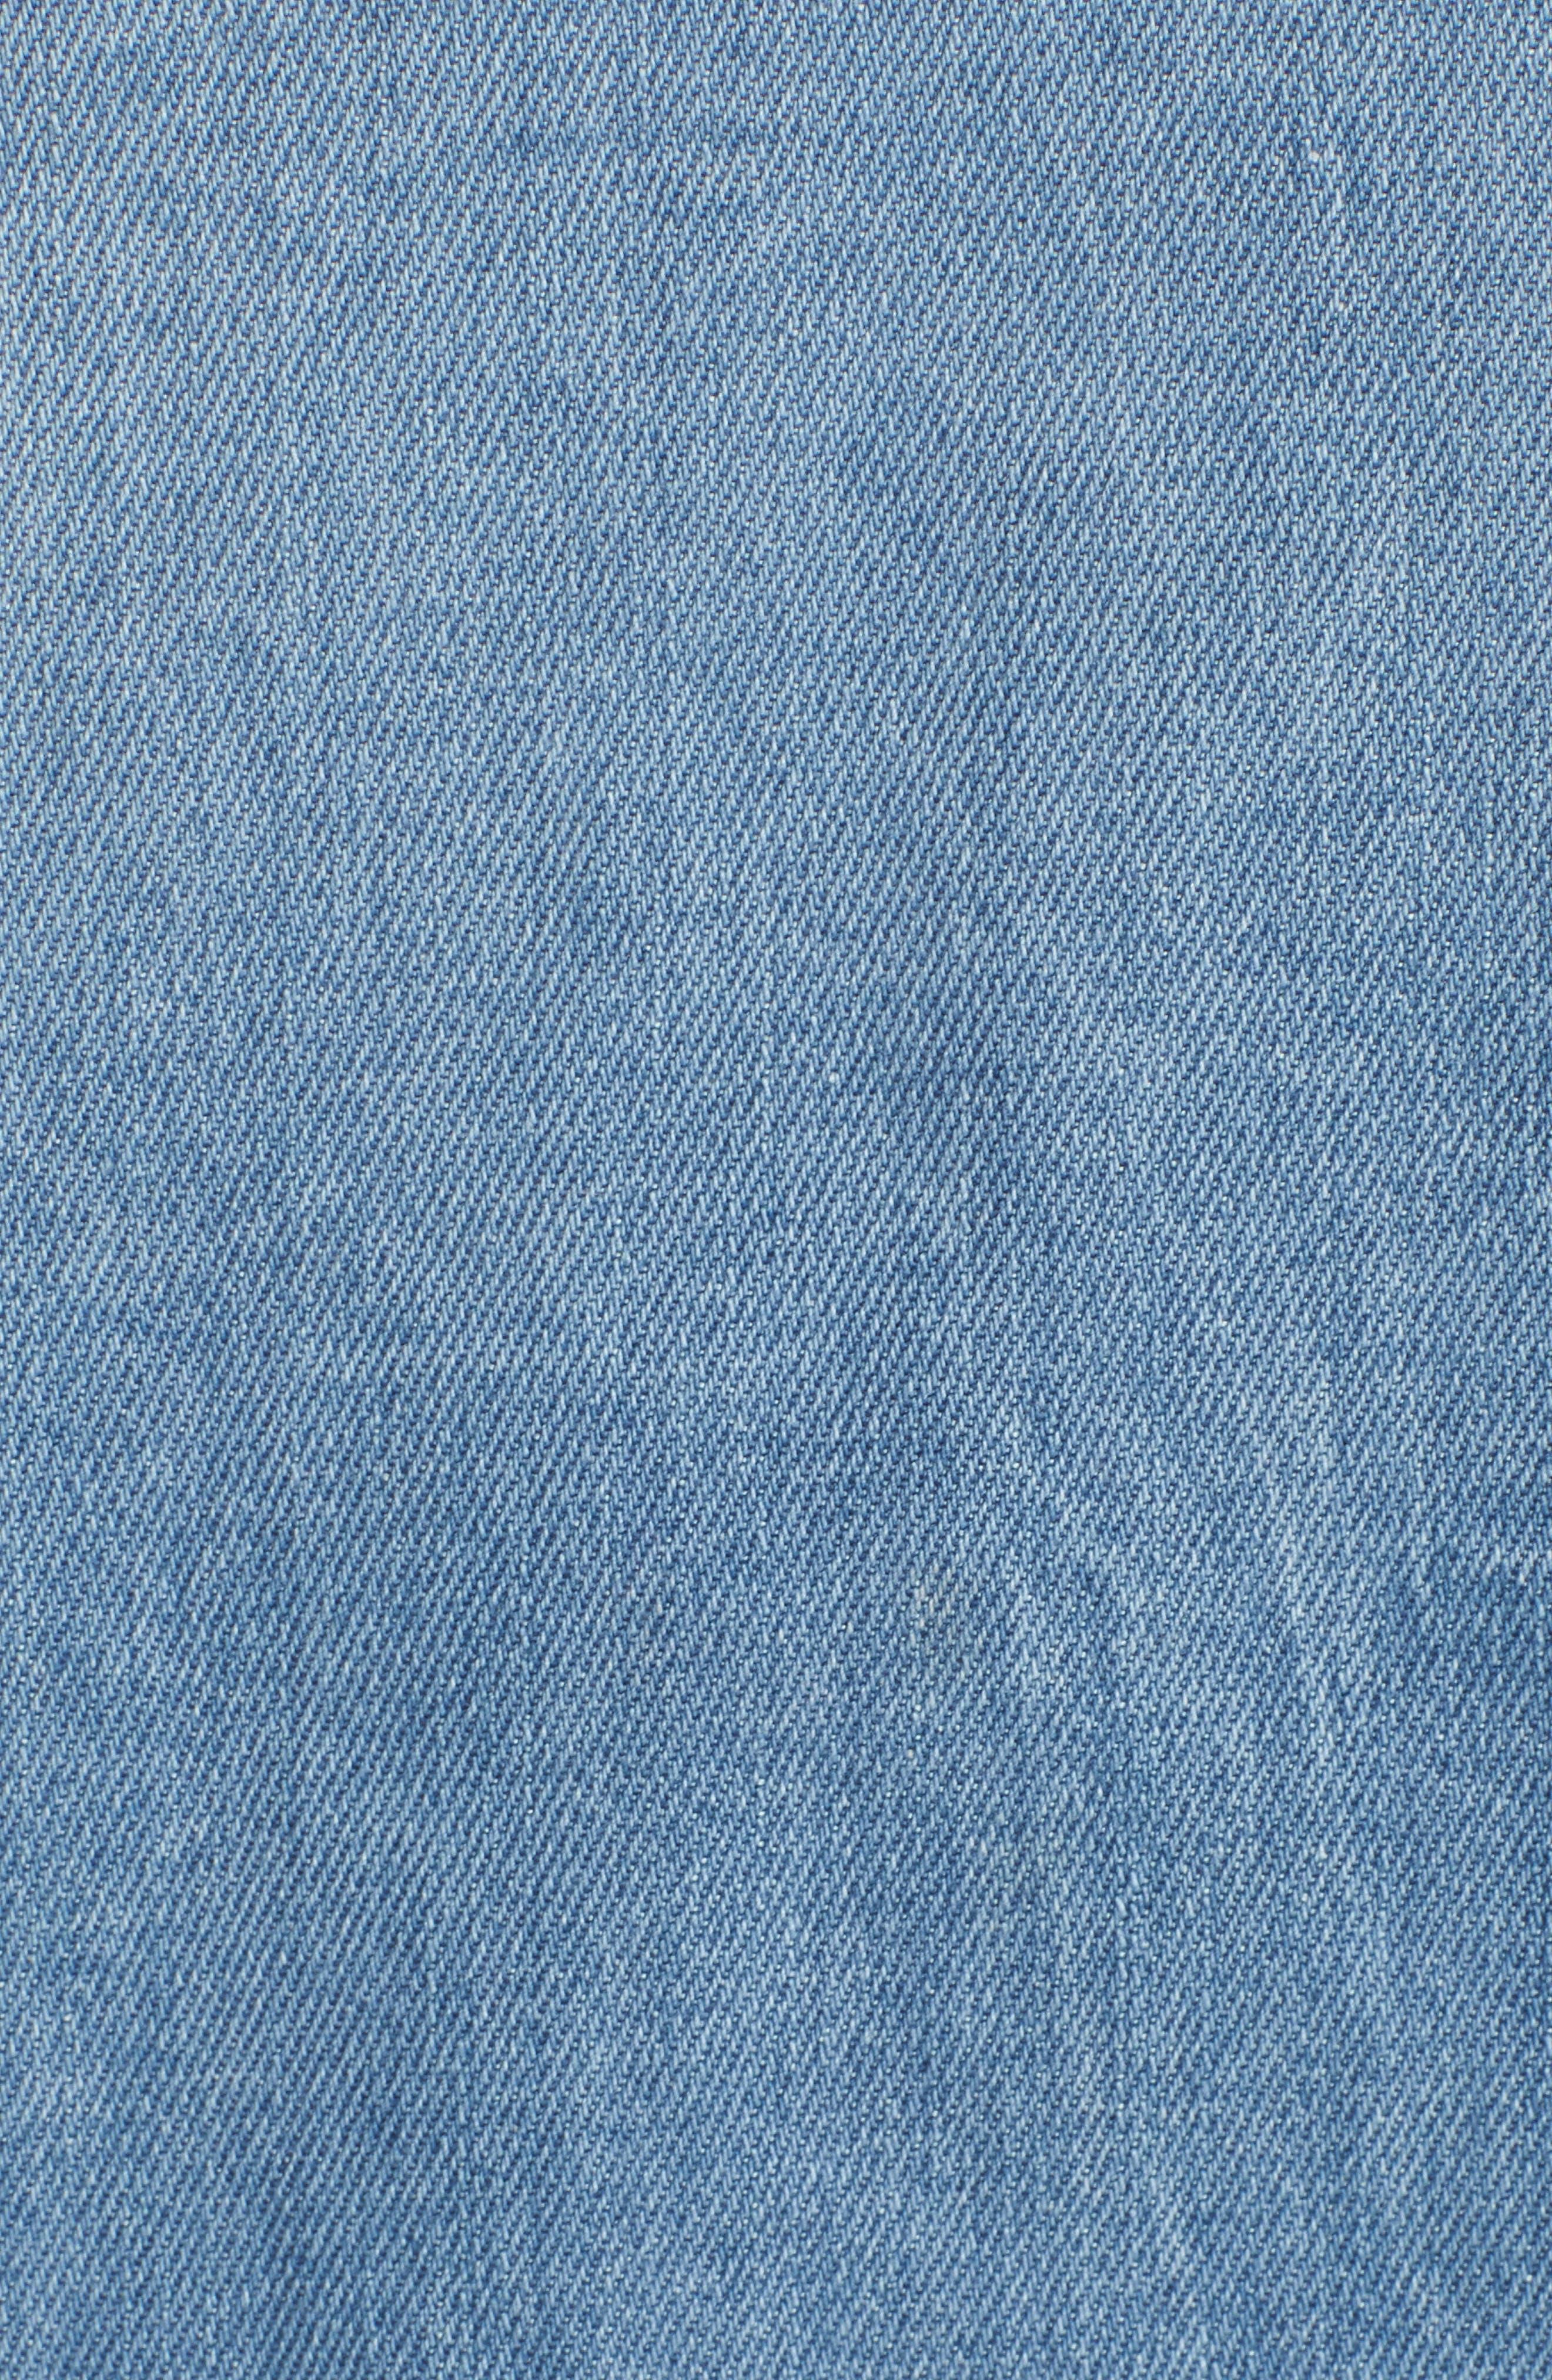 Kick Destroy Deconstructed Denim Jacket,                             Alternate thumbnail 7, color,                             465